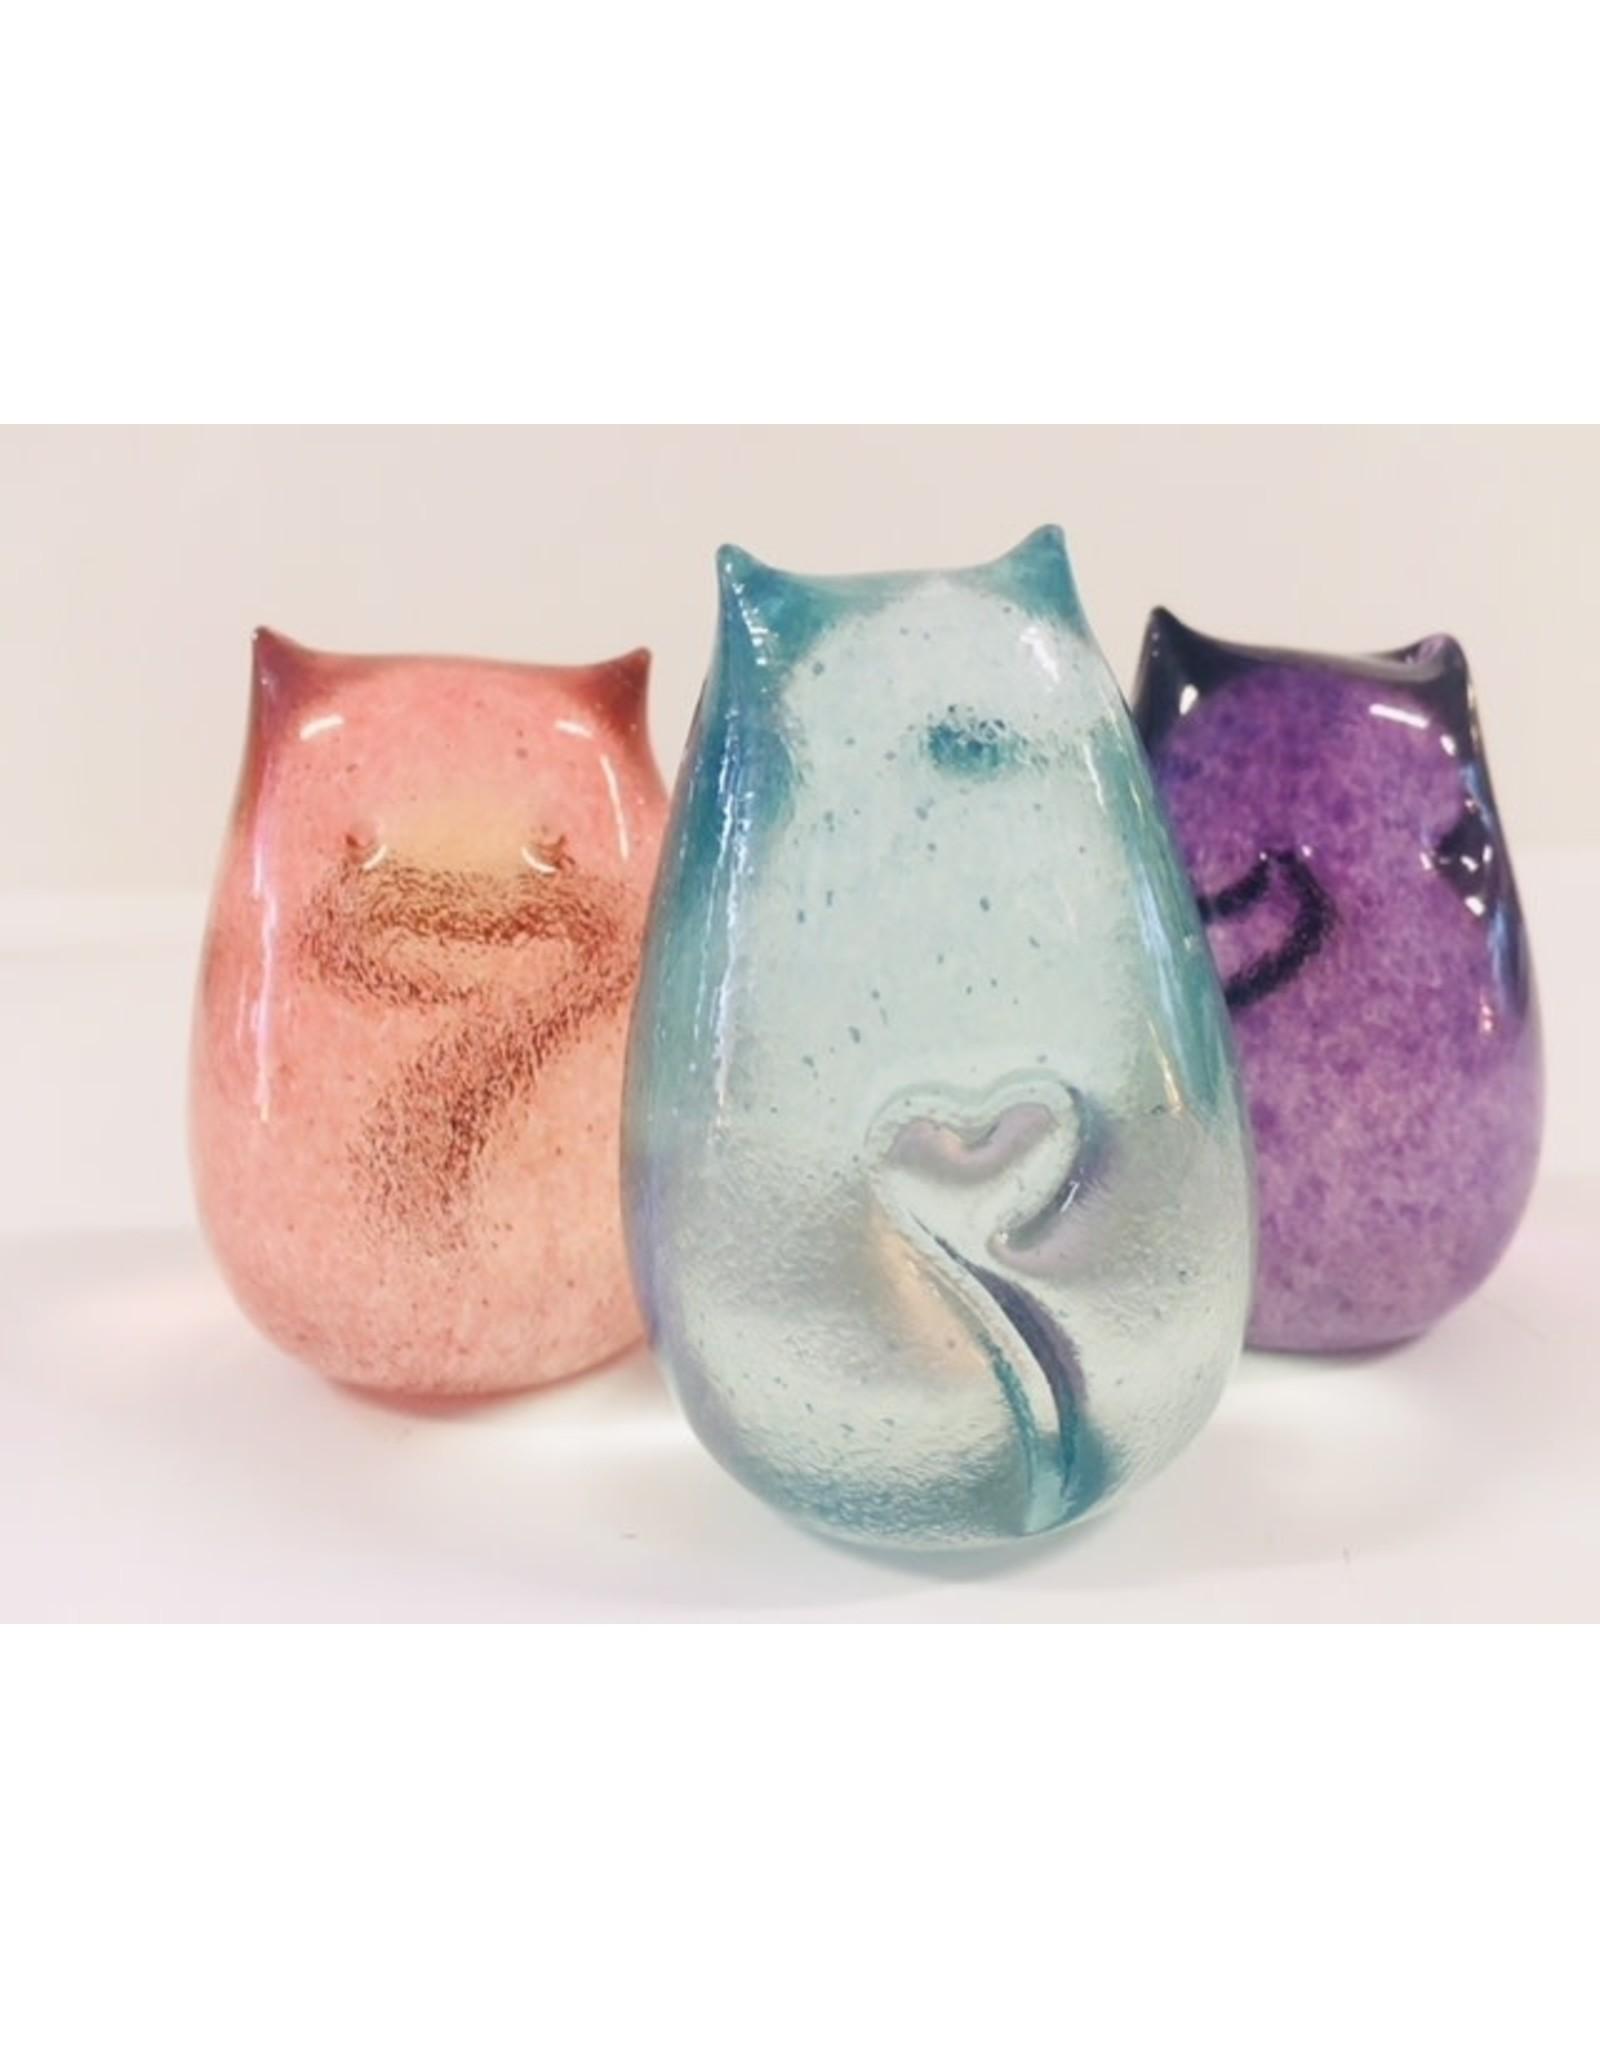 Henrietta Glass LOVE CATS (HENRI)